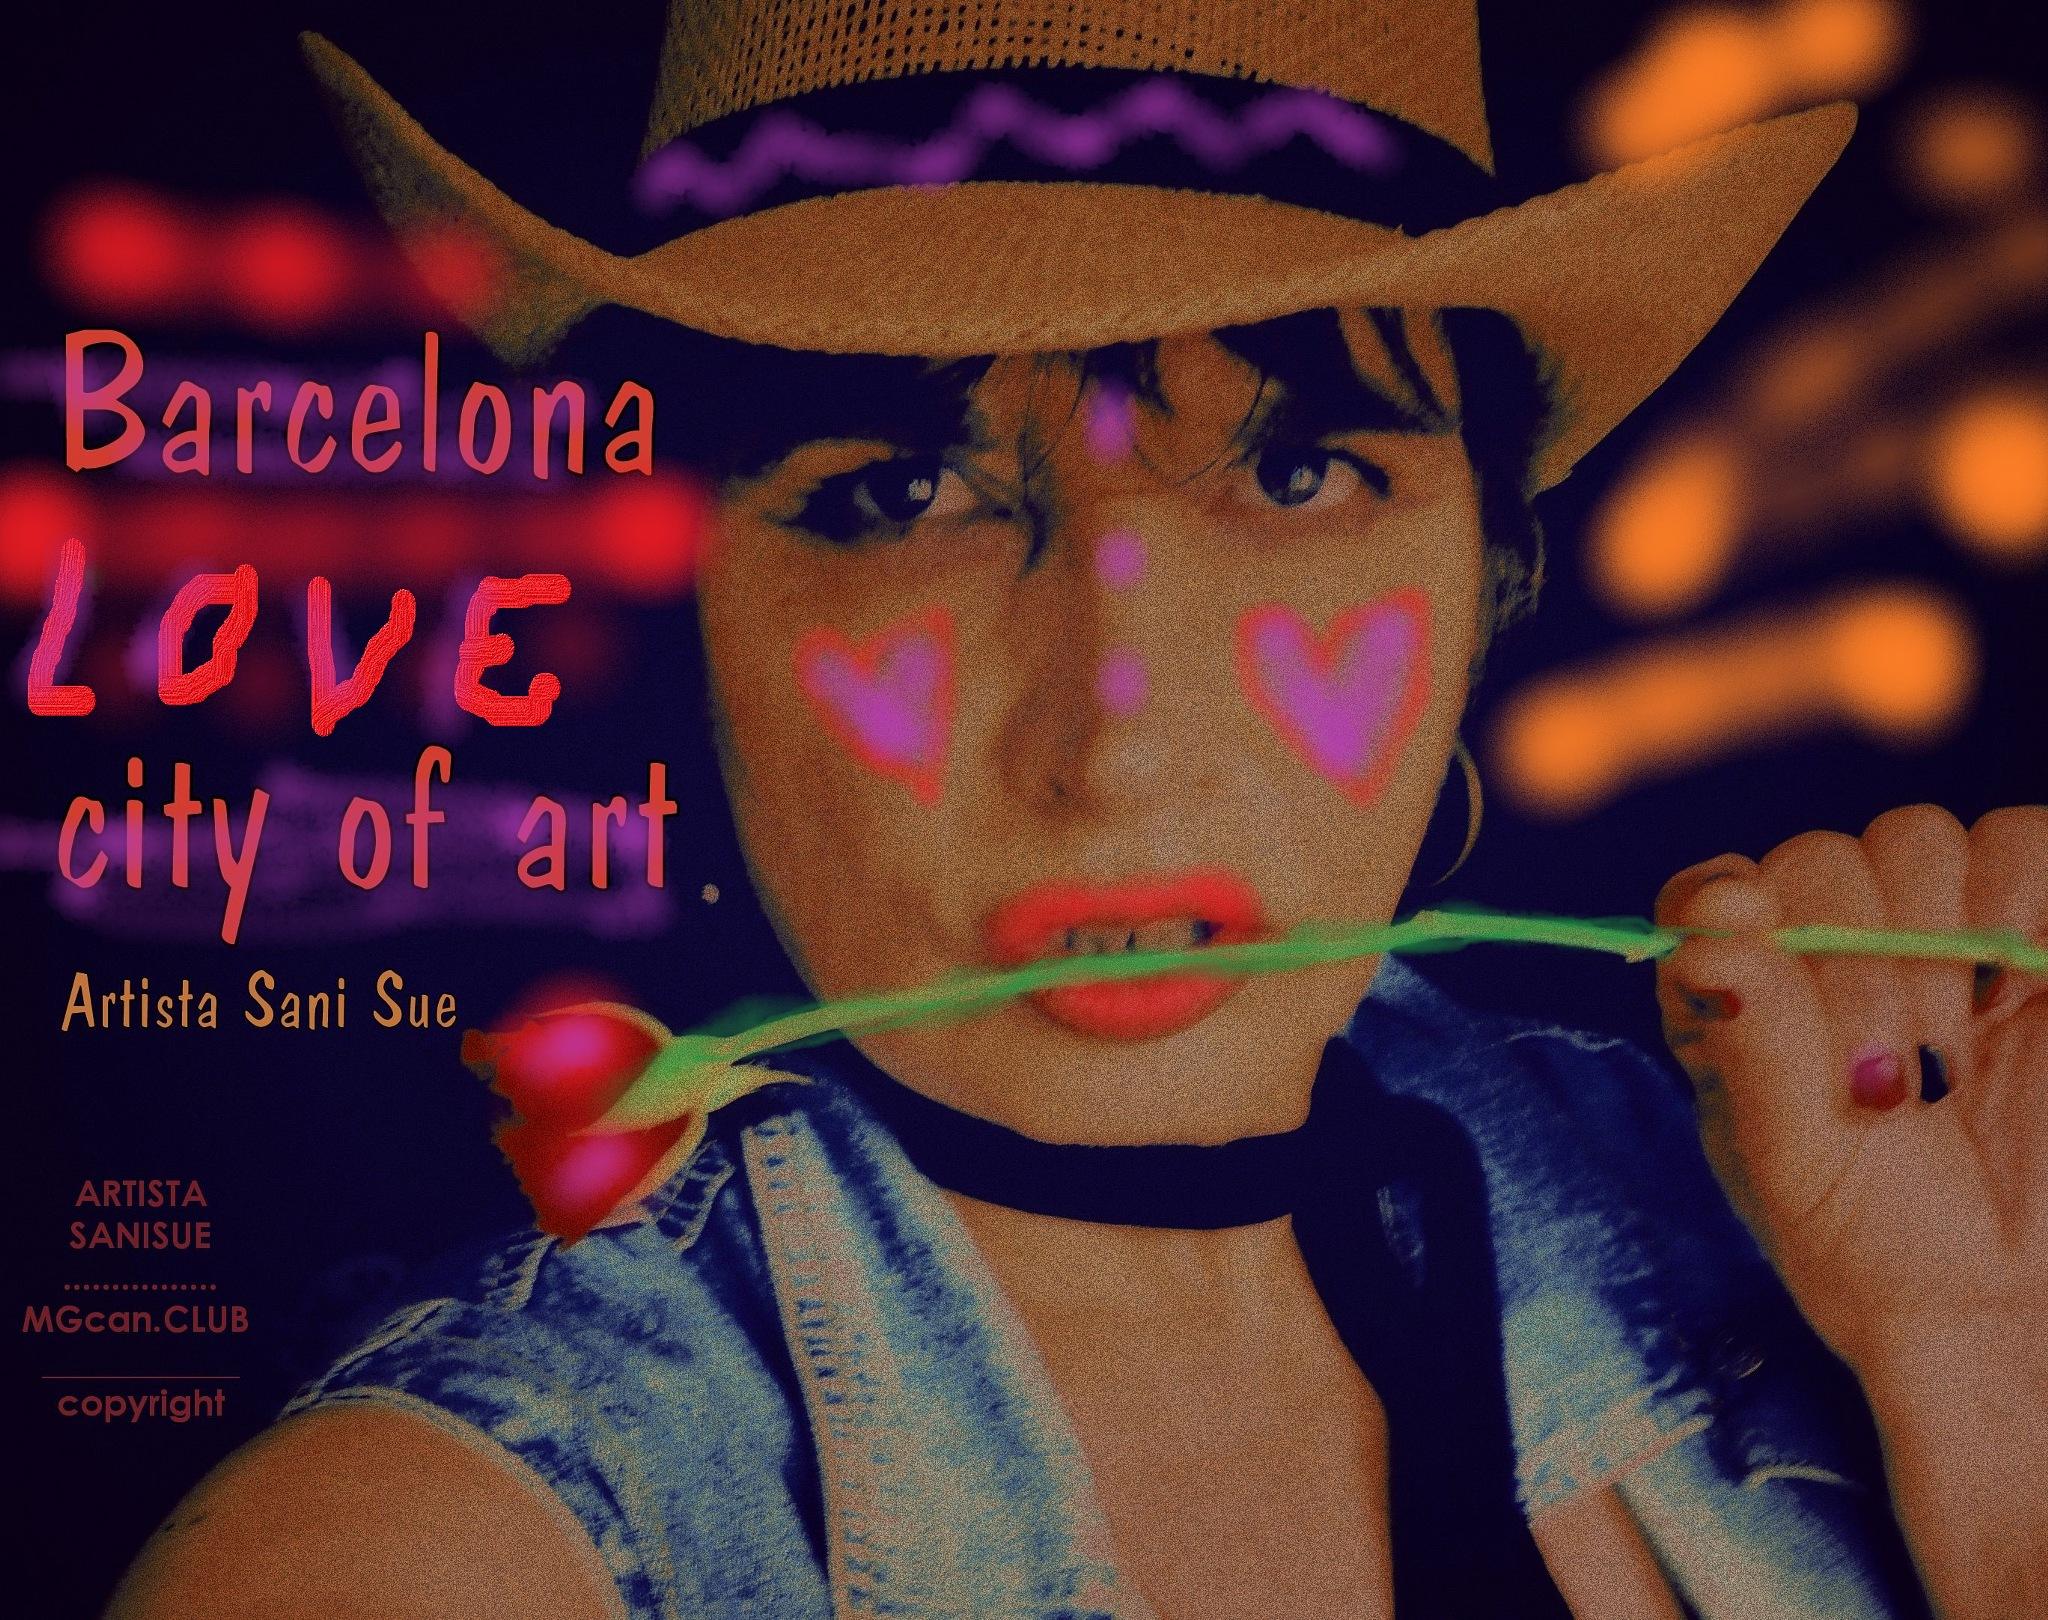 BARCELONA by ARTISTA SANI SUE